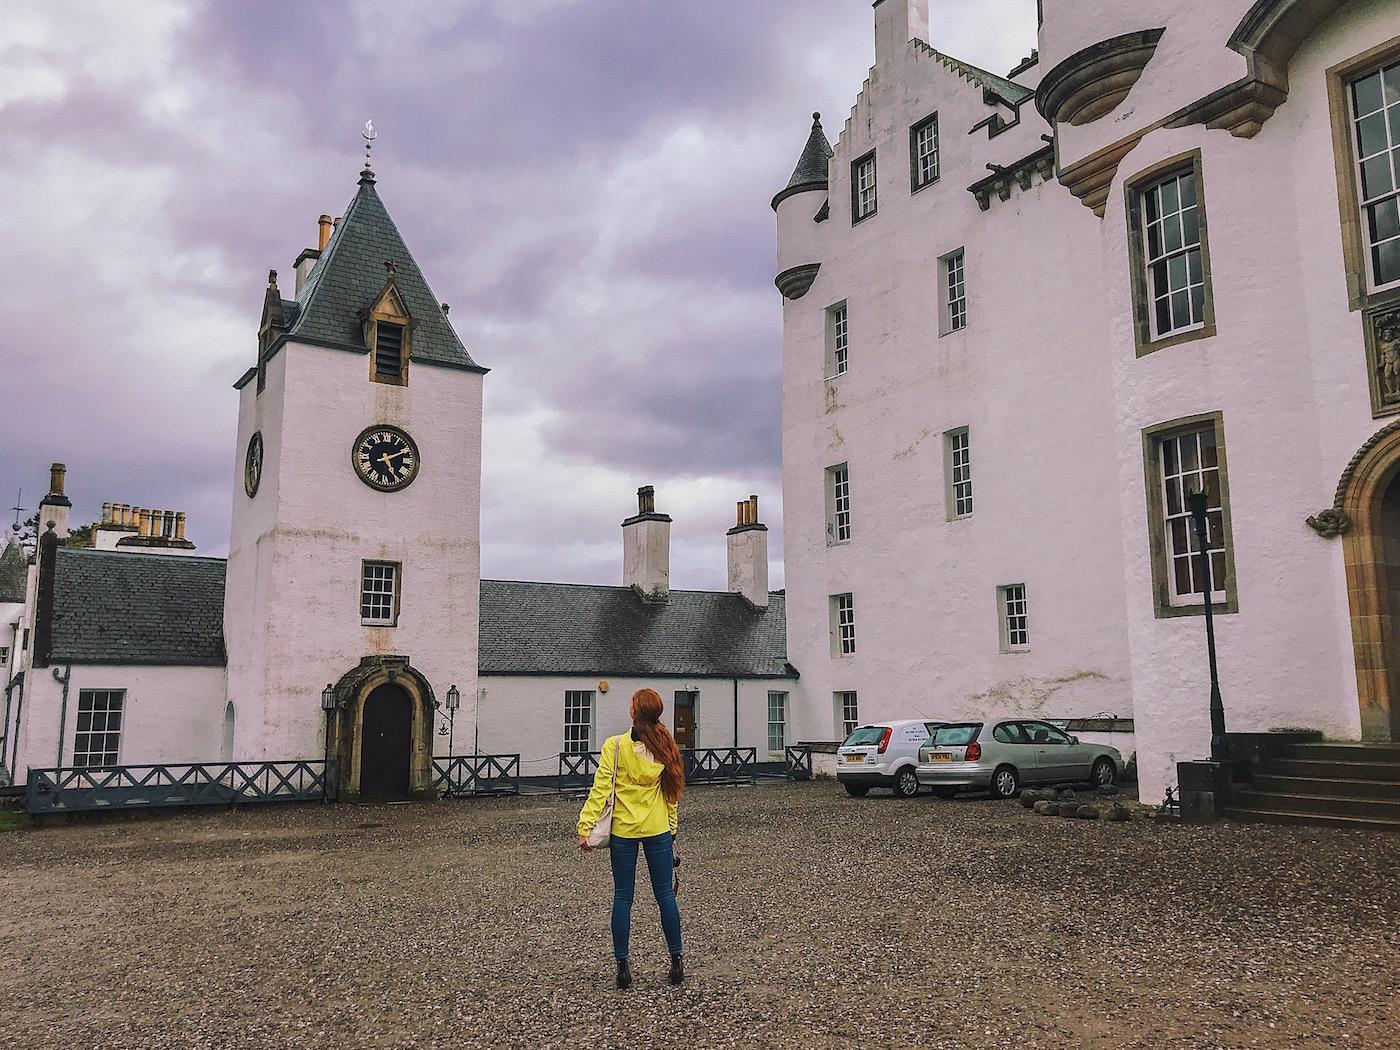 redhead-round-the-world-scotland-blogger-travel-castle-glenlivet-highlands-yellow.JPG